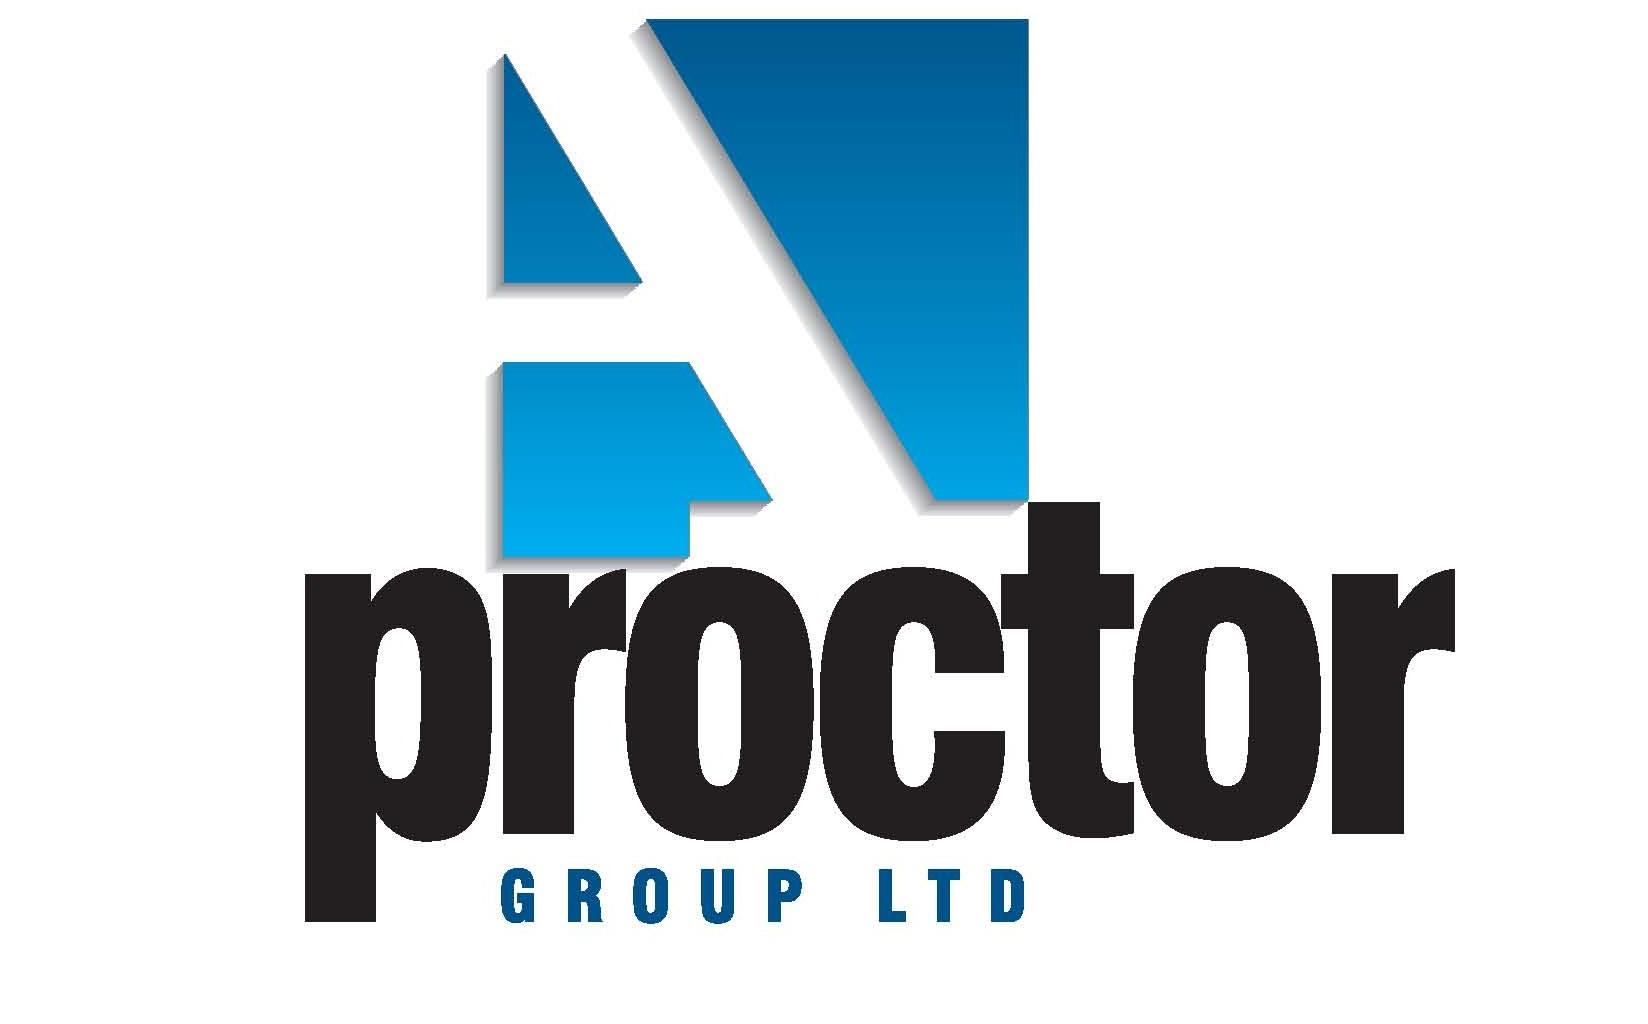 proctor-logo-2-4.jpg